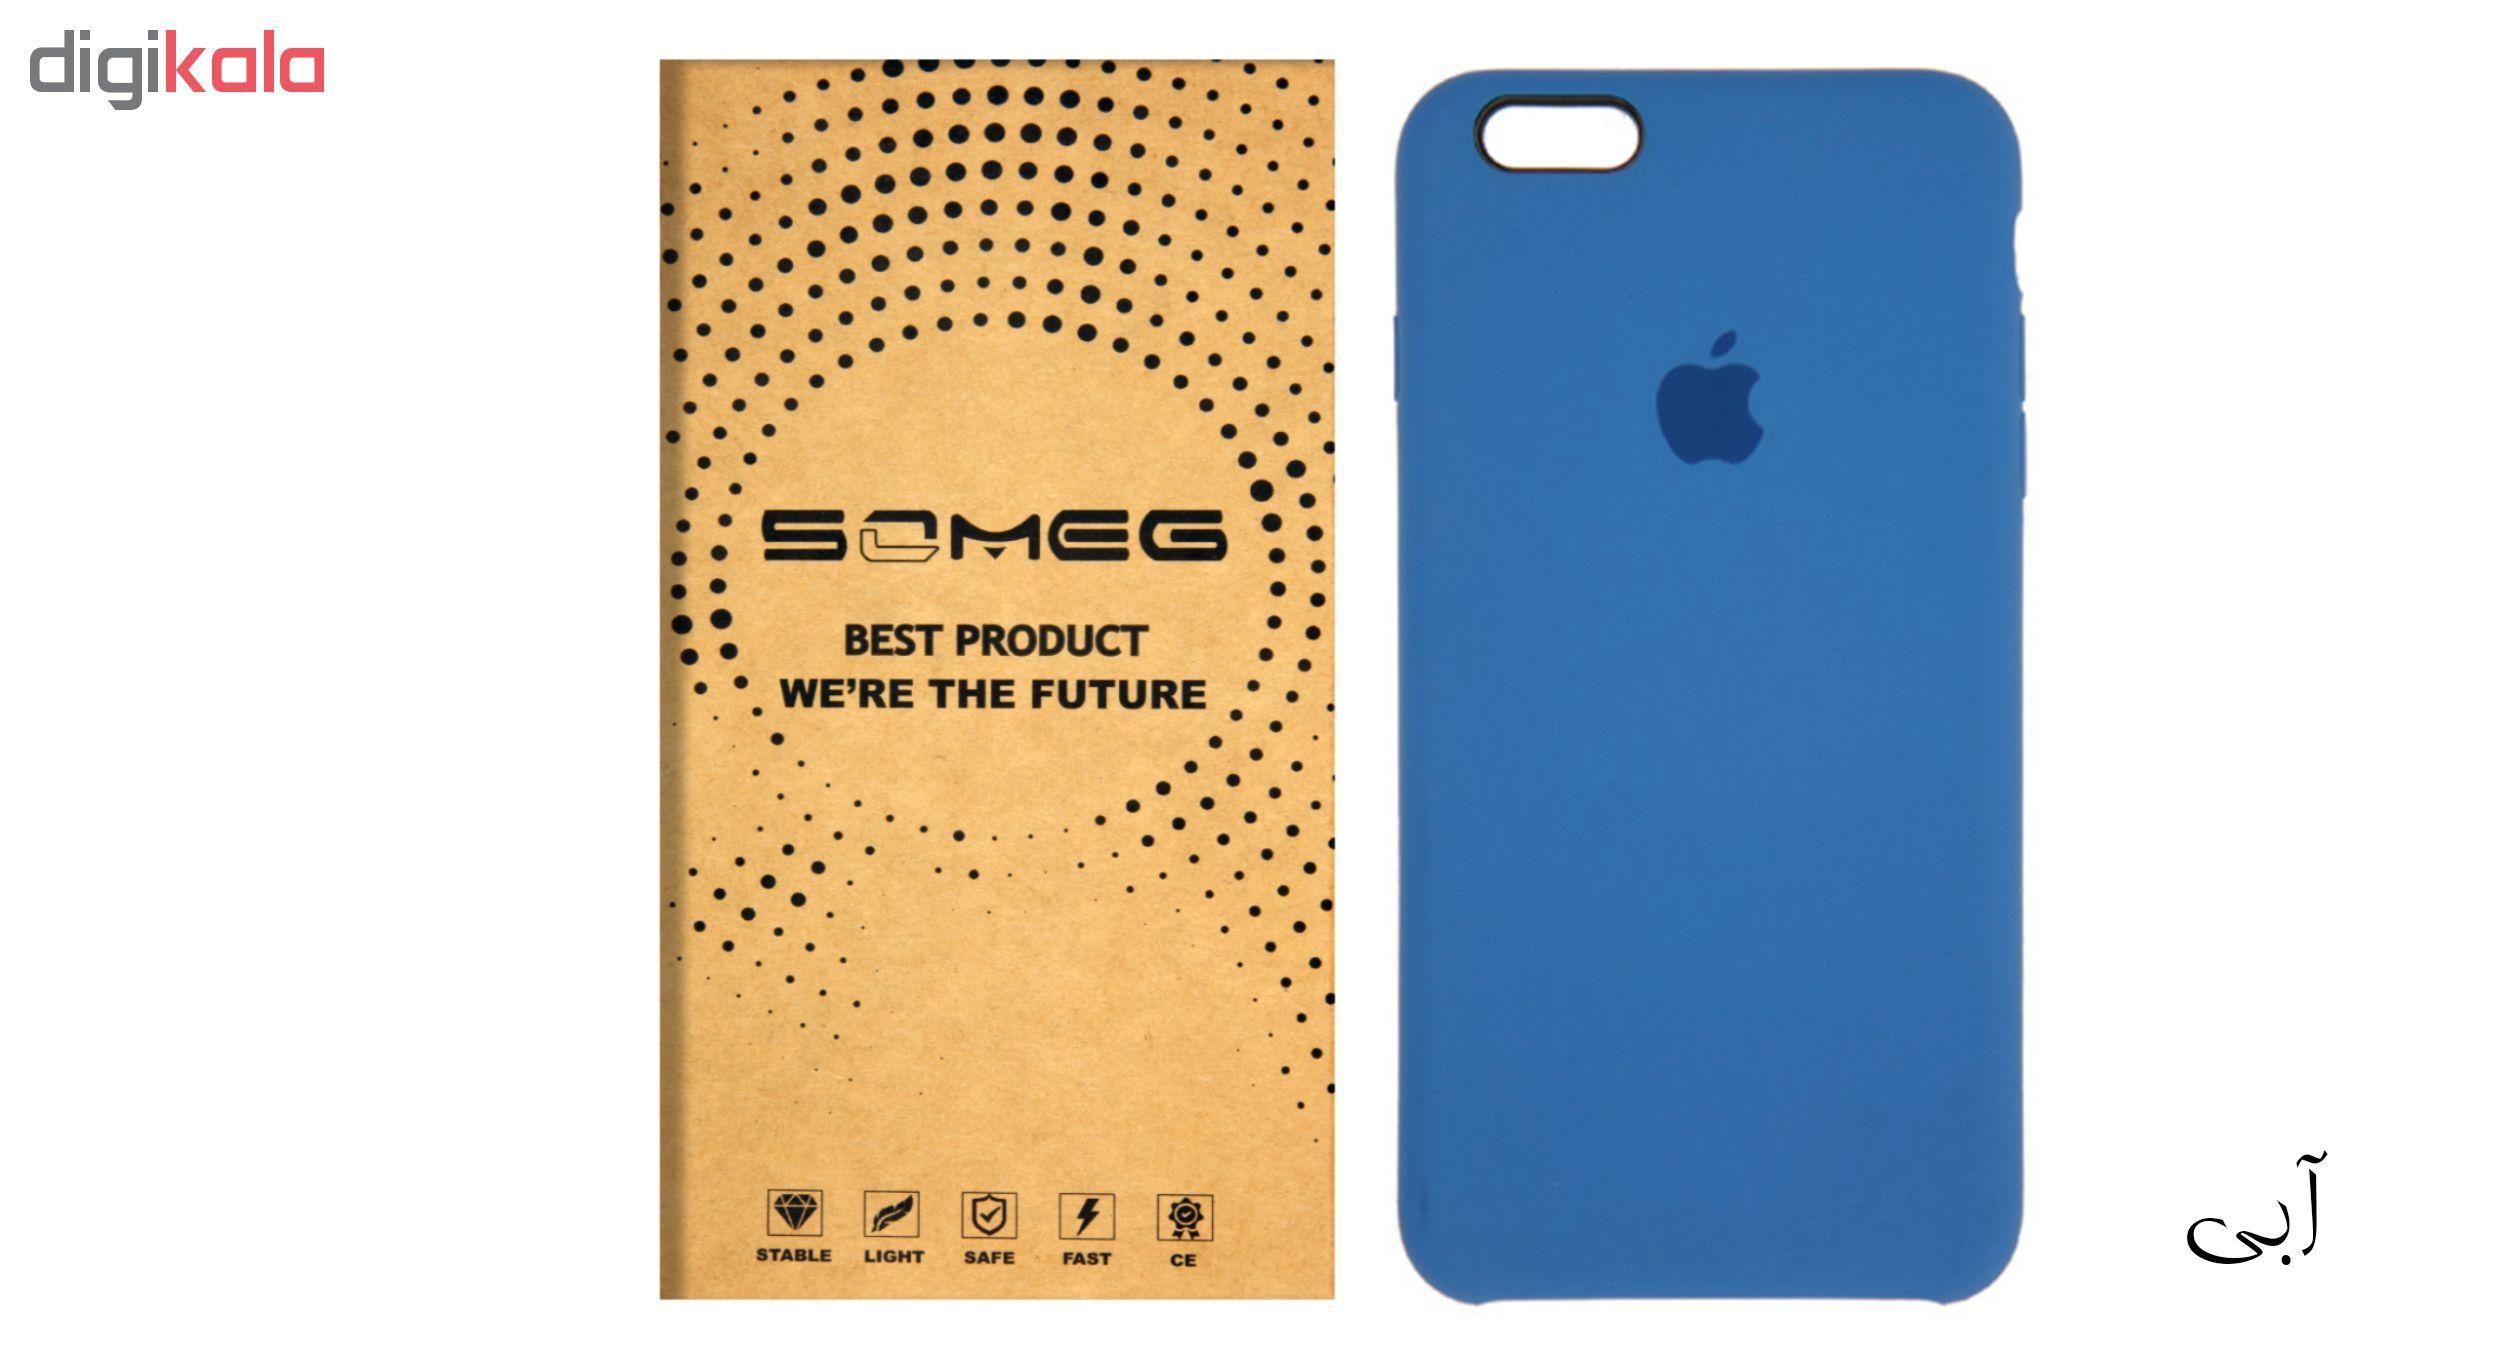 کاور سومگ مدل SIC مناسب برای گوشی موبایل اپل iPhone 6/6s main 1 14